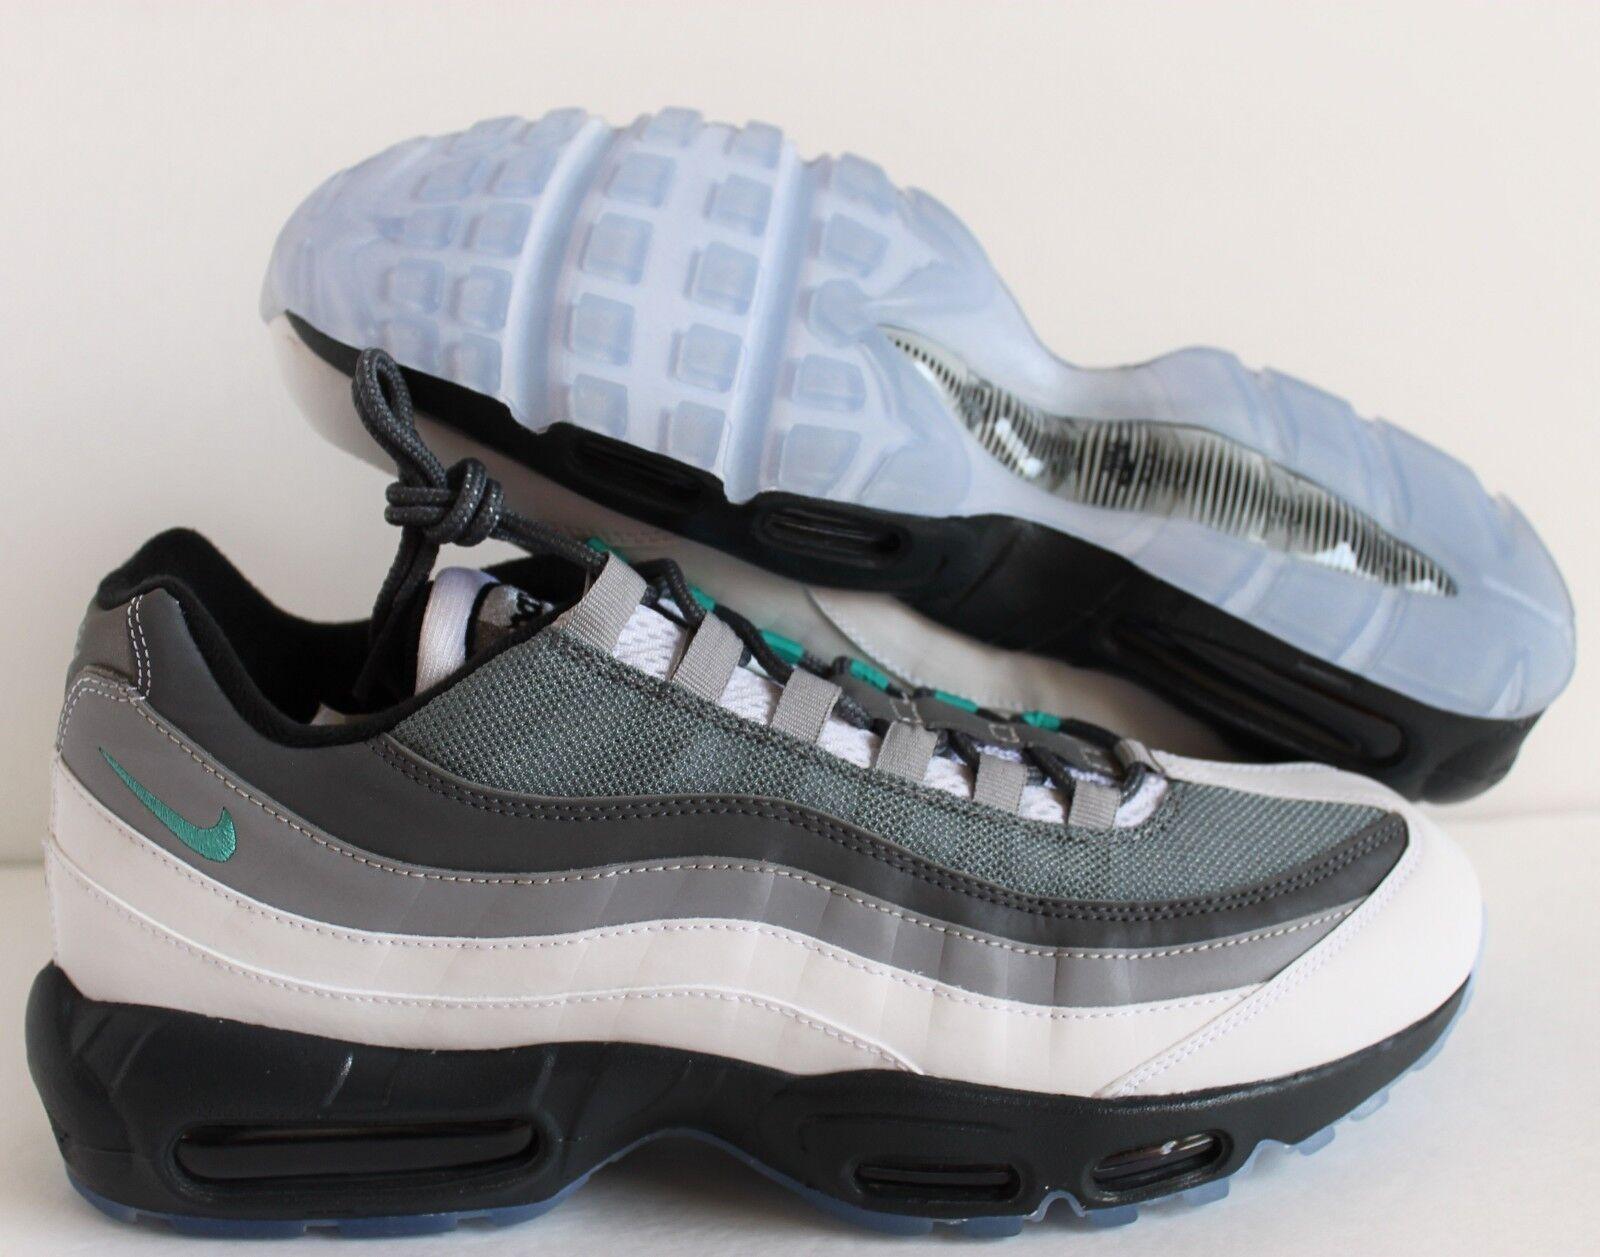 Nike Men Air Max 95 iD Grey-White-Green sz 11.5 [818592-996]